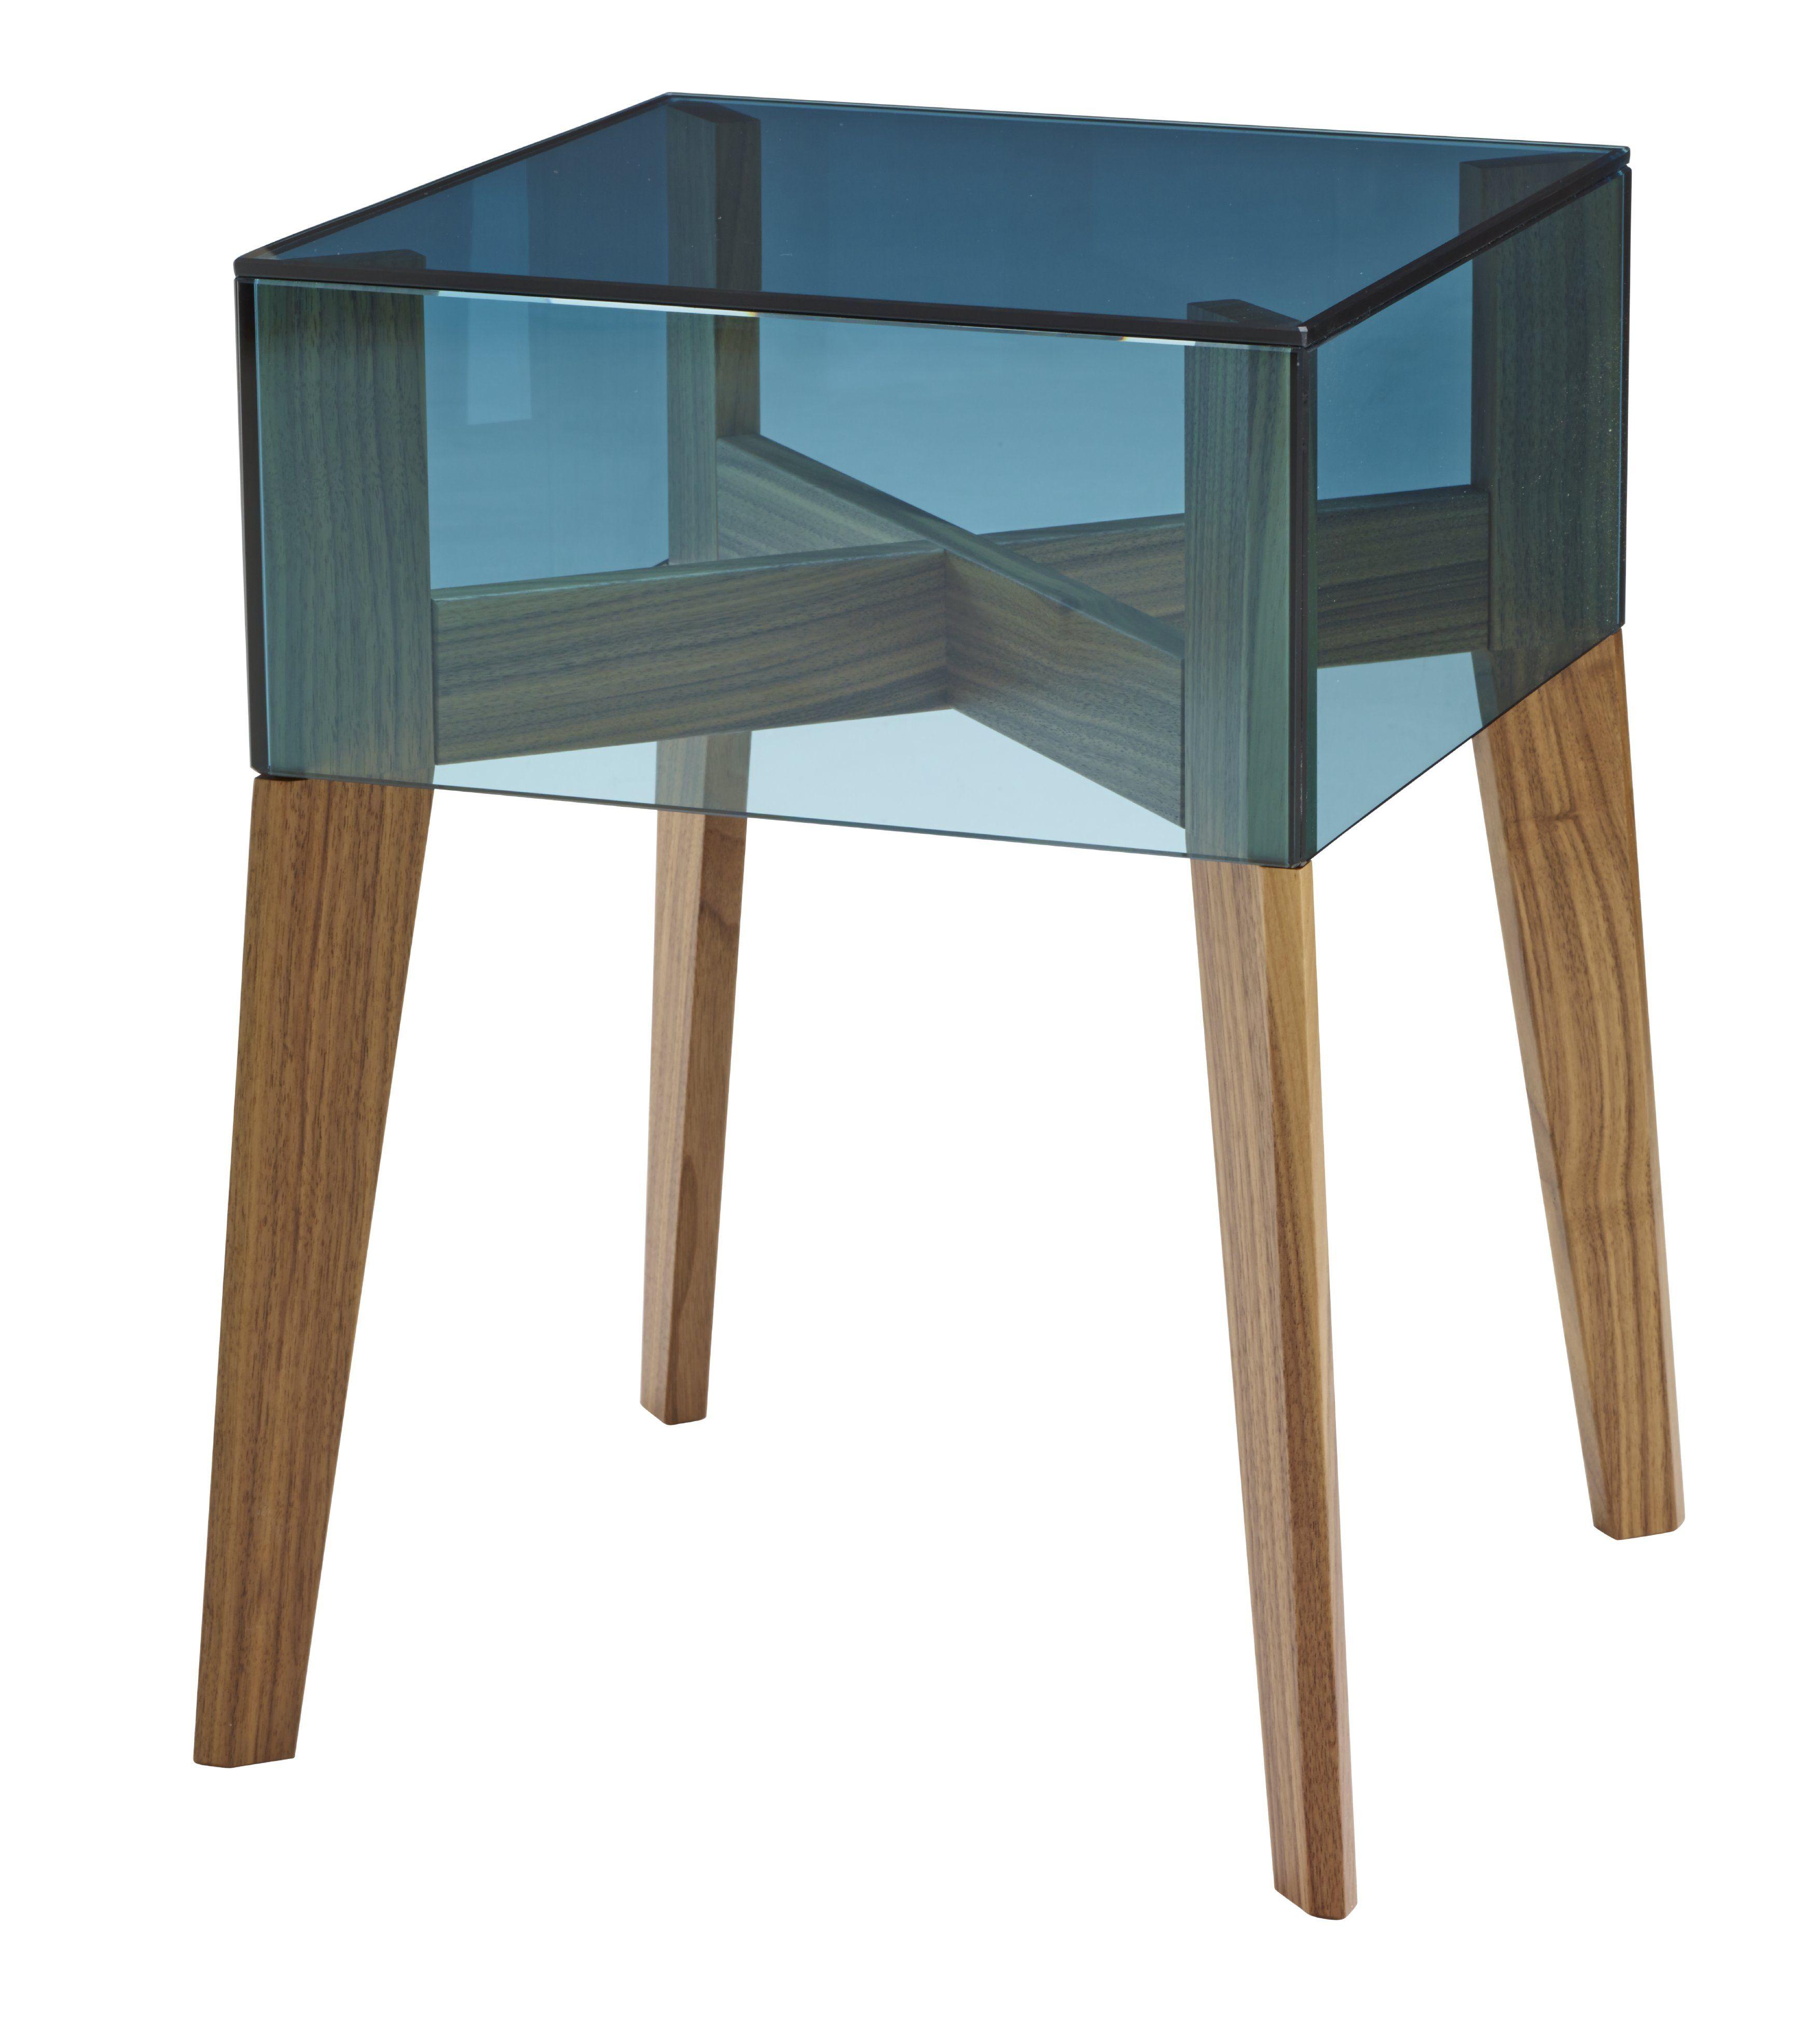 on the rock marie aurore stiker metral neuheiten 2014 pinterest neuheiten. Black Bedroom Furniture Sets. Home Design Ideas